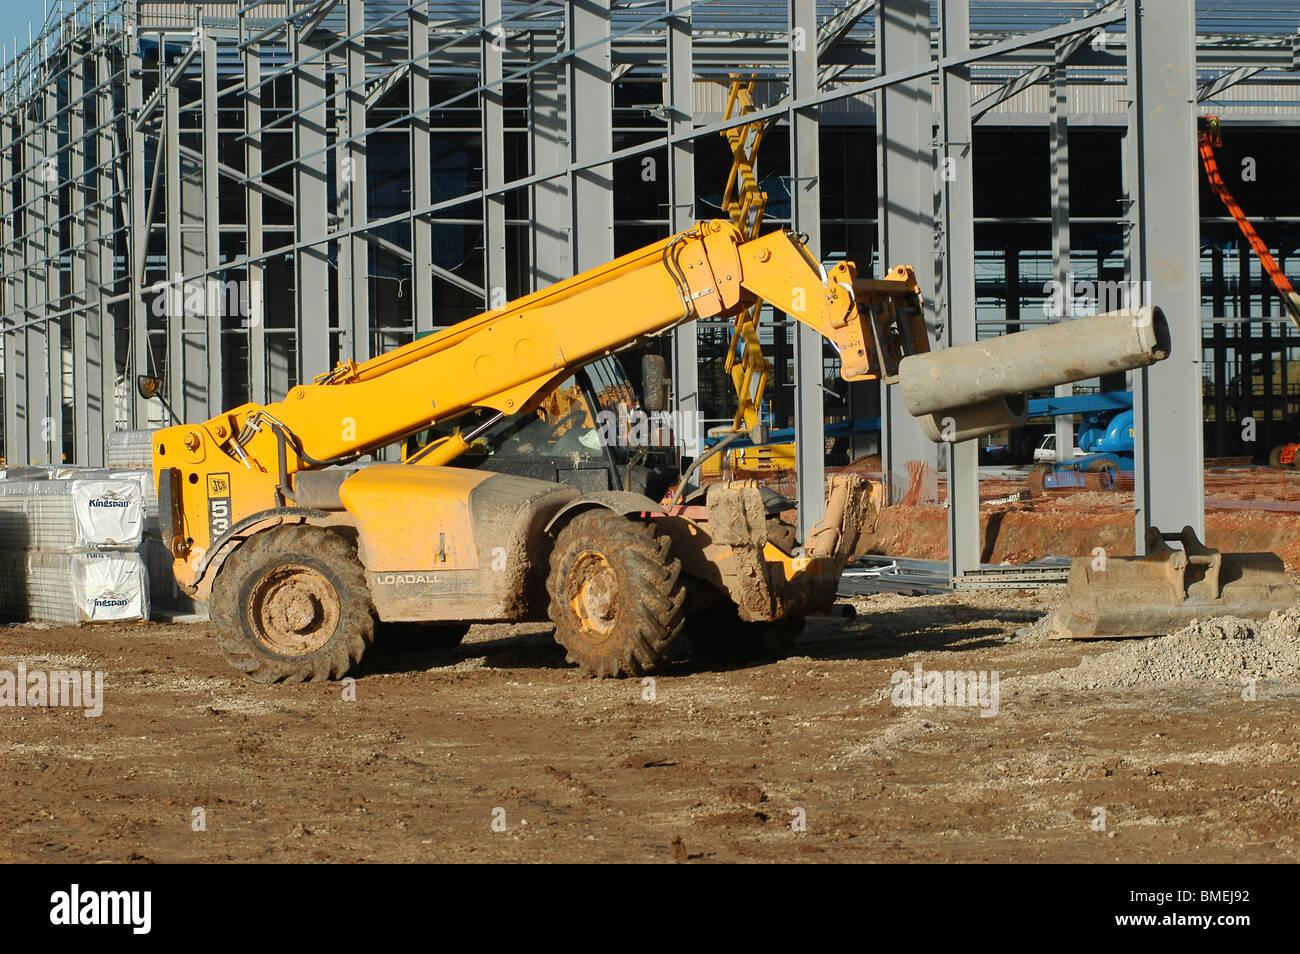 Jcb Machines Stock Photos & Jcb Machines Stock Images - Alamy